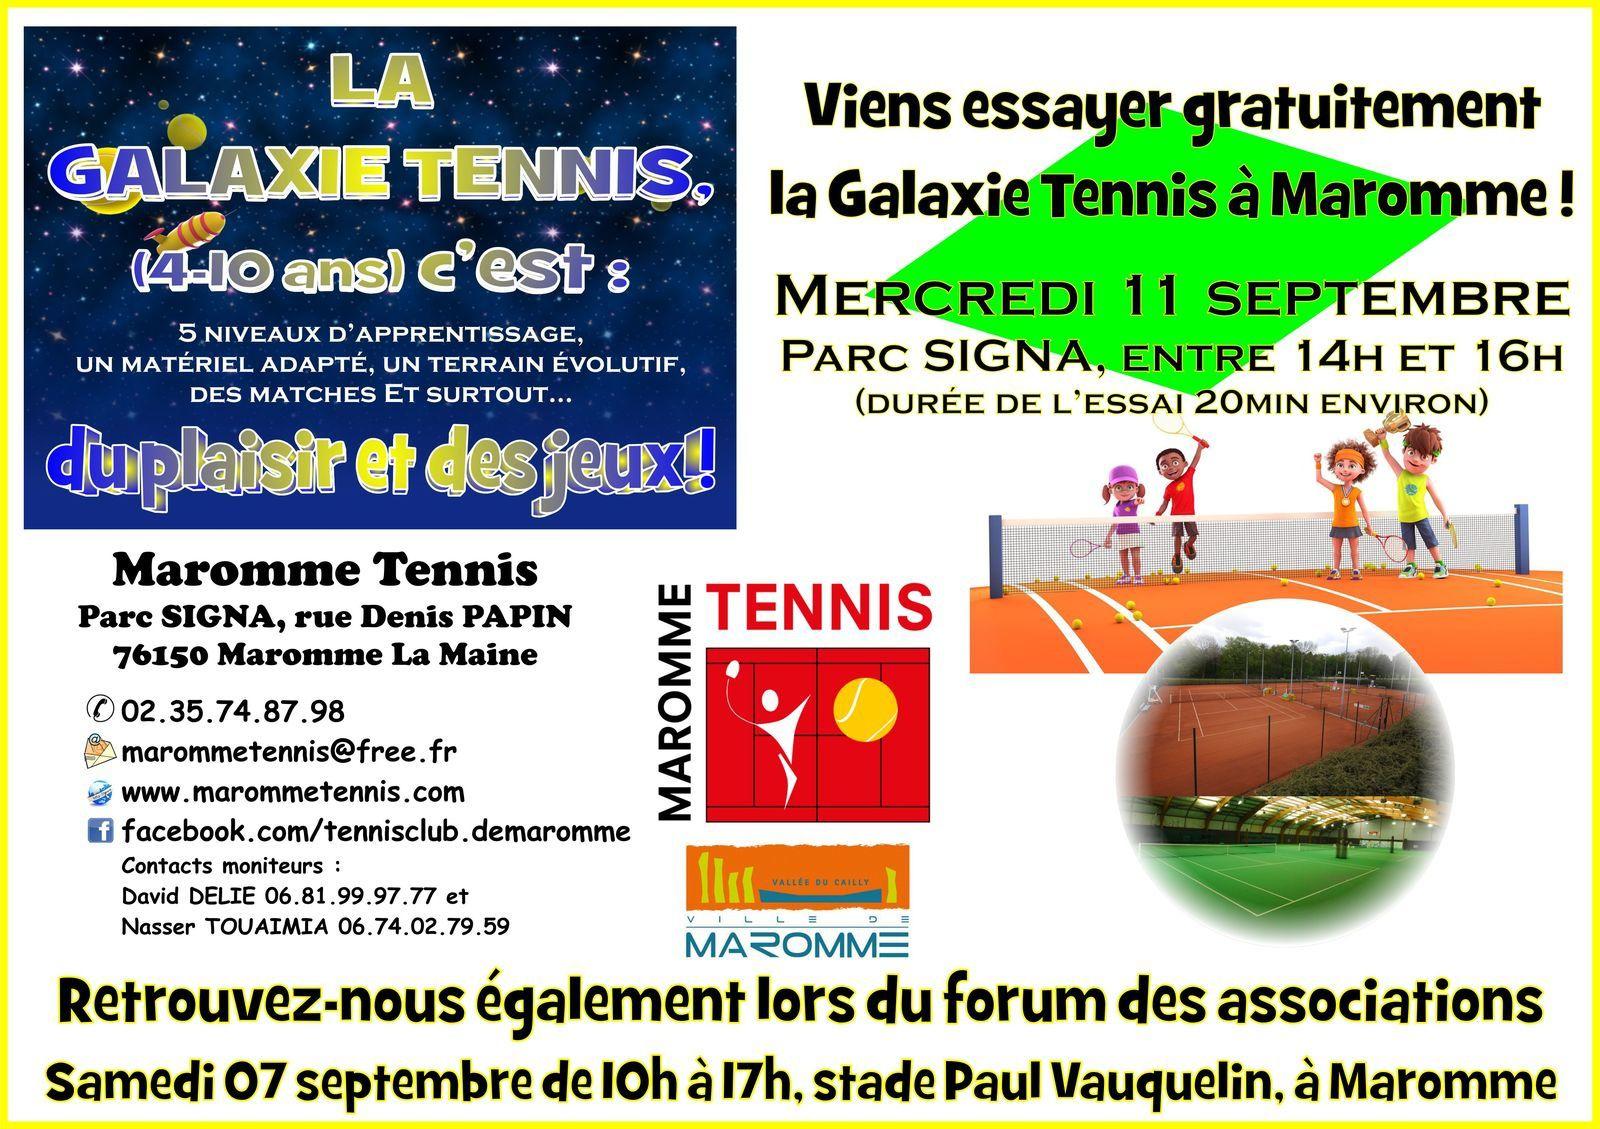 Viens découvrir la Galaxie Tennis !